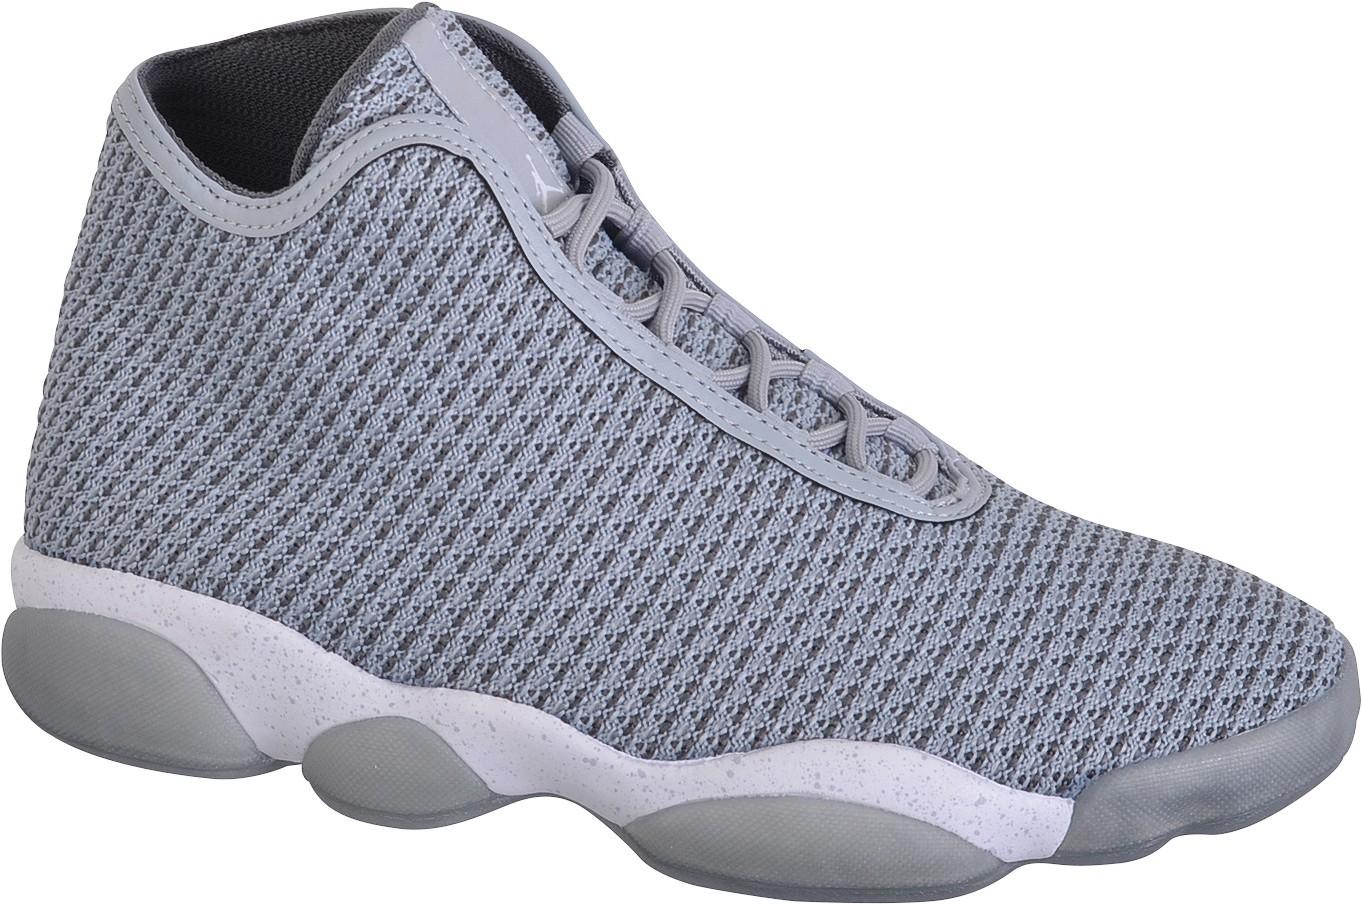 best sneakers uk cheap sale well known nike jordan horizon femme